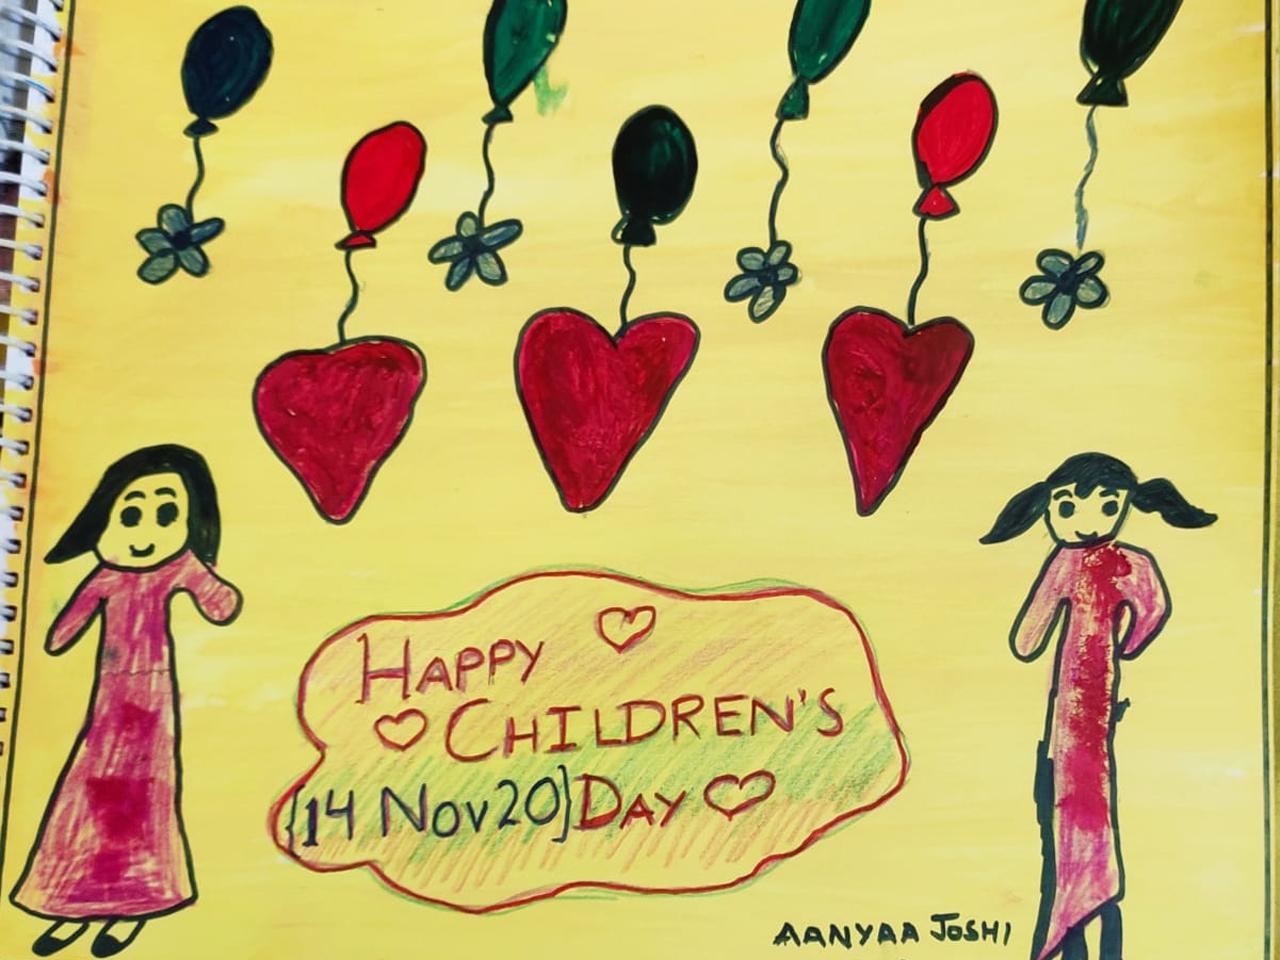 CHILDREN'S DAY WITH FUN ACTIVITIES 2020